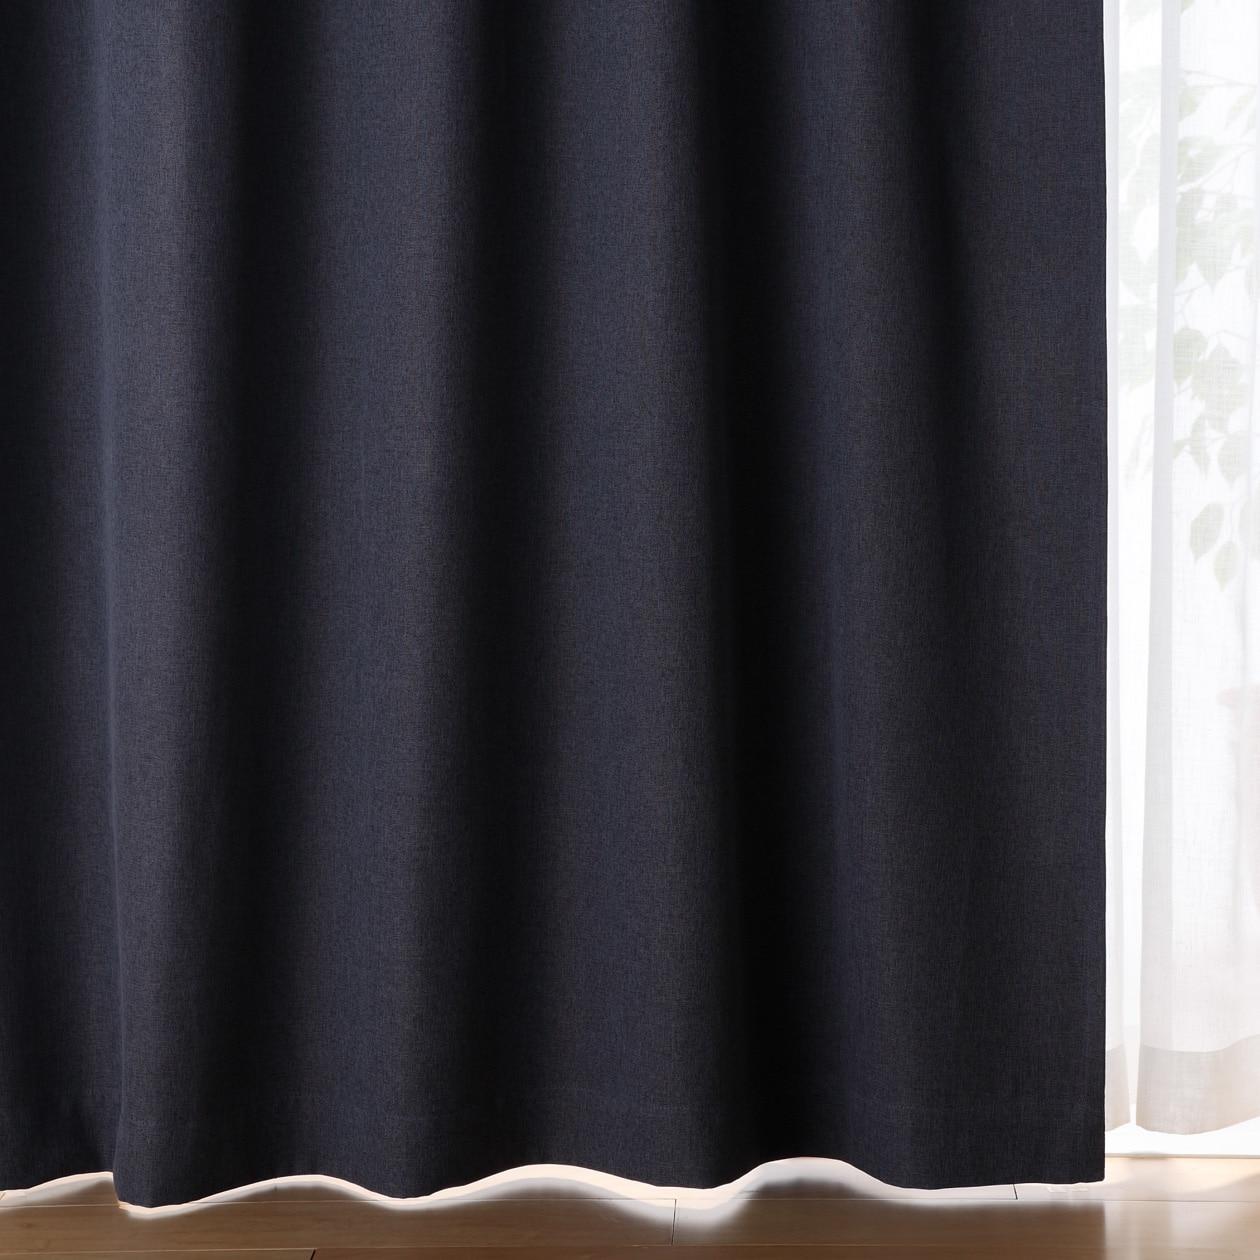 RoomClip商品情報 - ポリエステルドビー織(防炎・遮光性)プリーツカーテン/ダークブルー